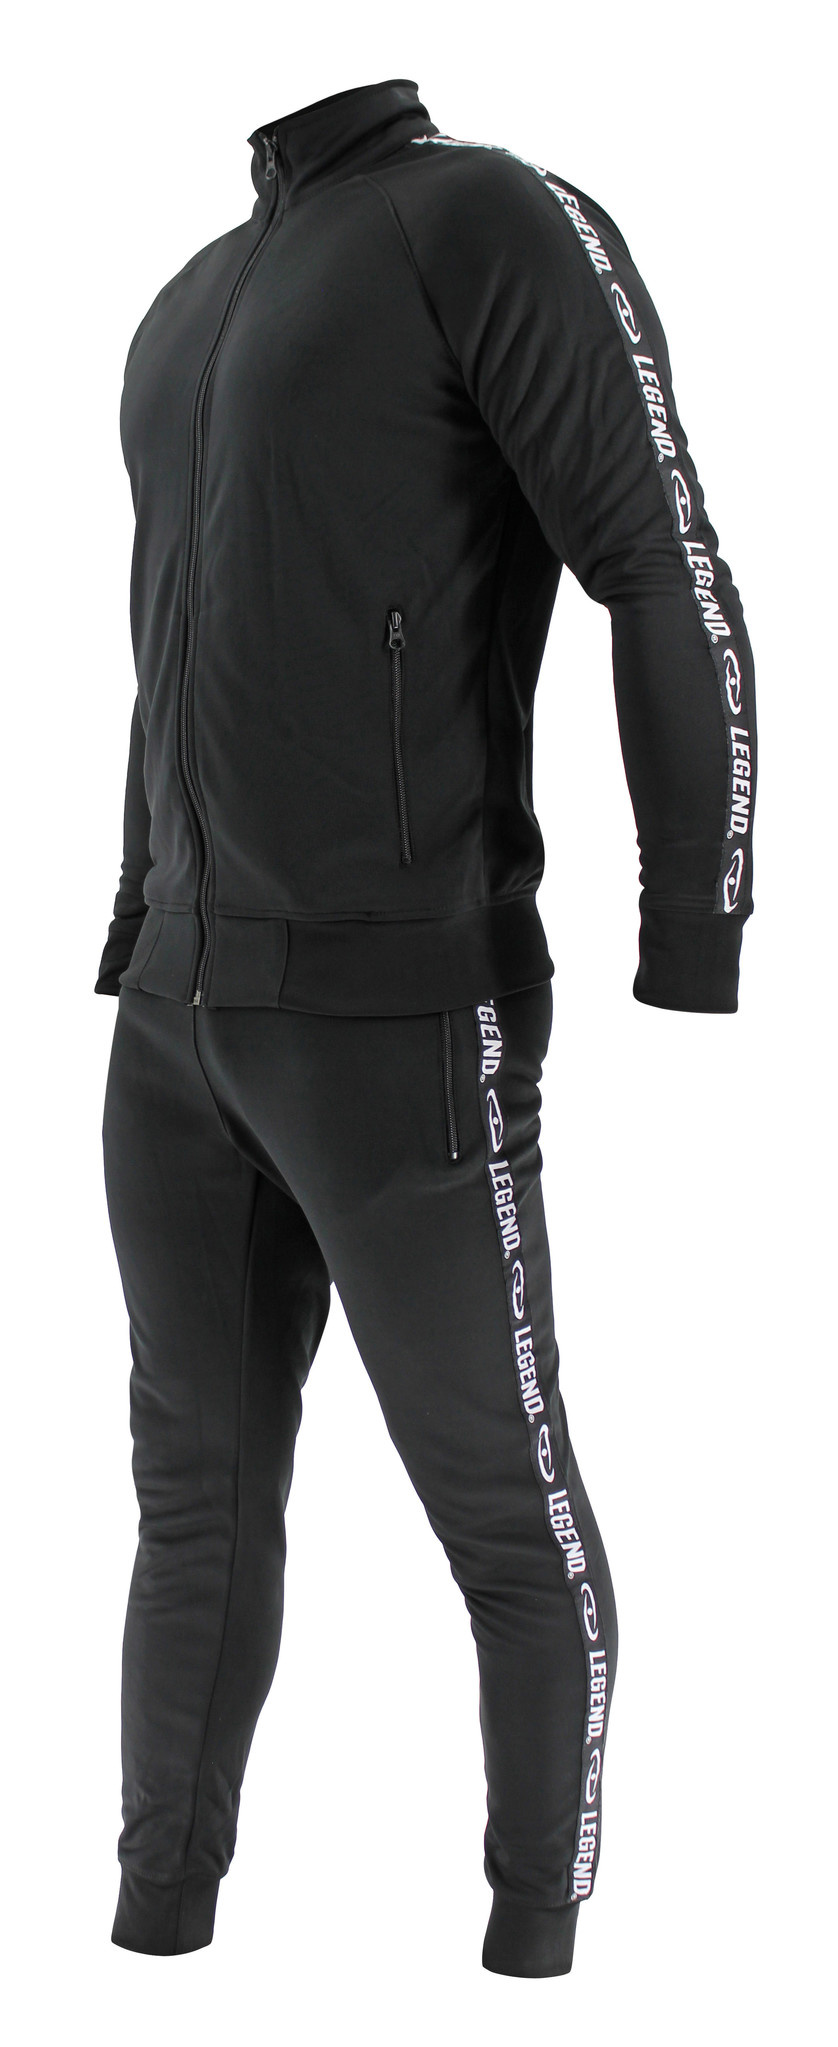 Legend B-keuze Trainingspak Unisex SlimFit Zwart